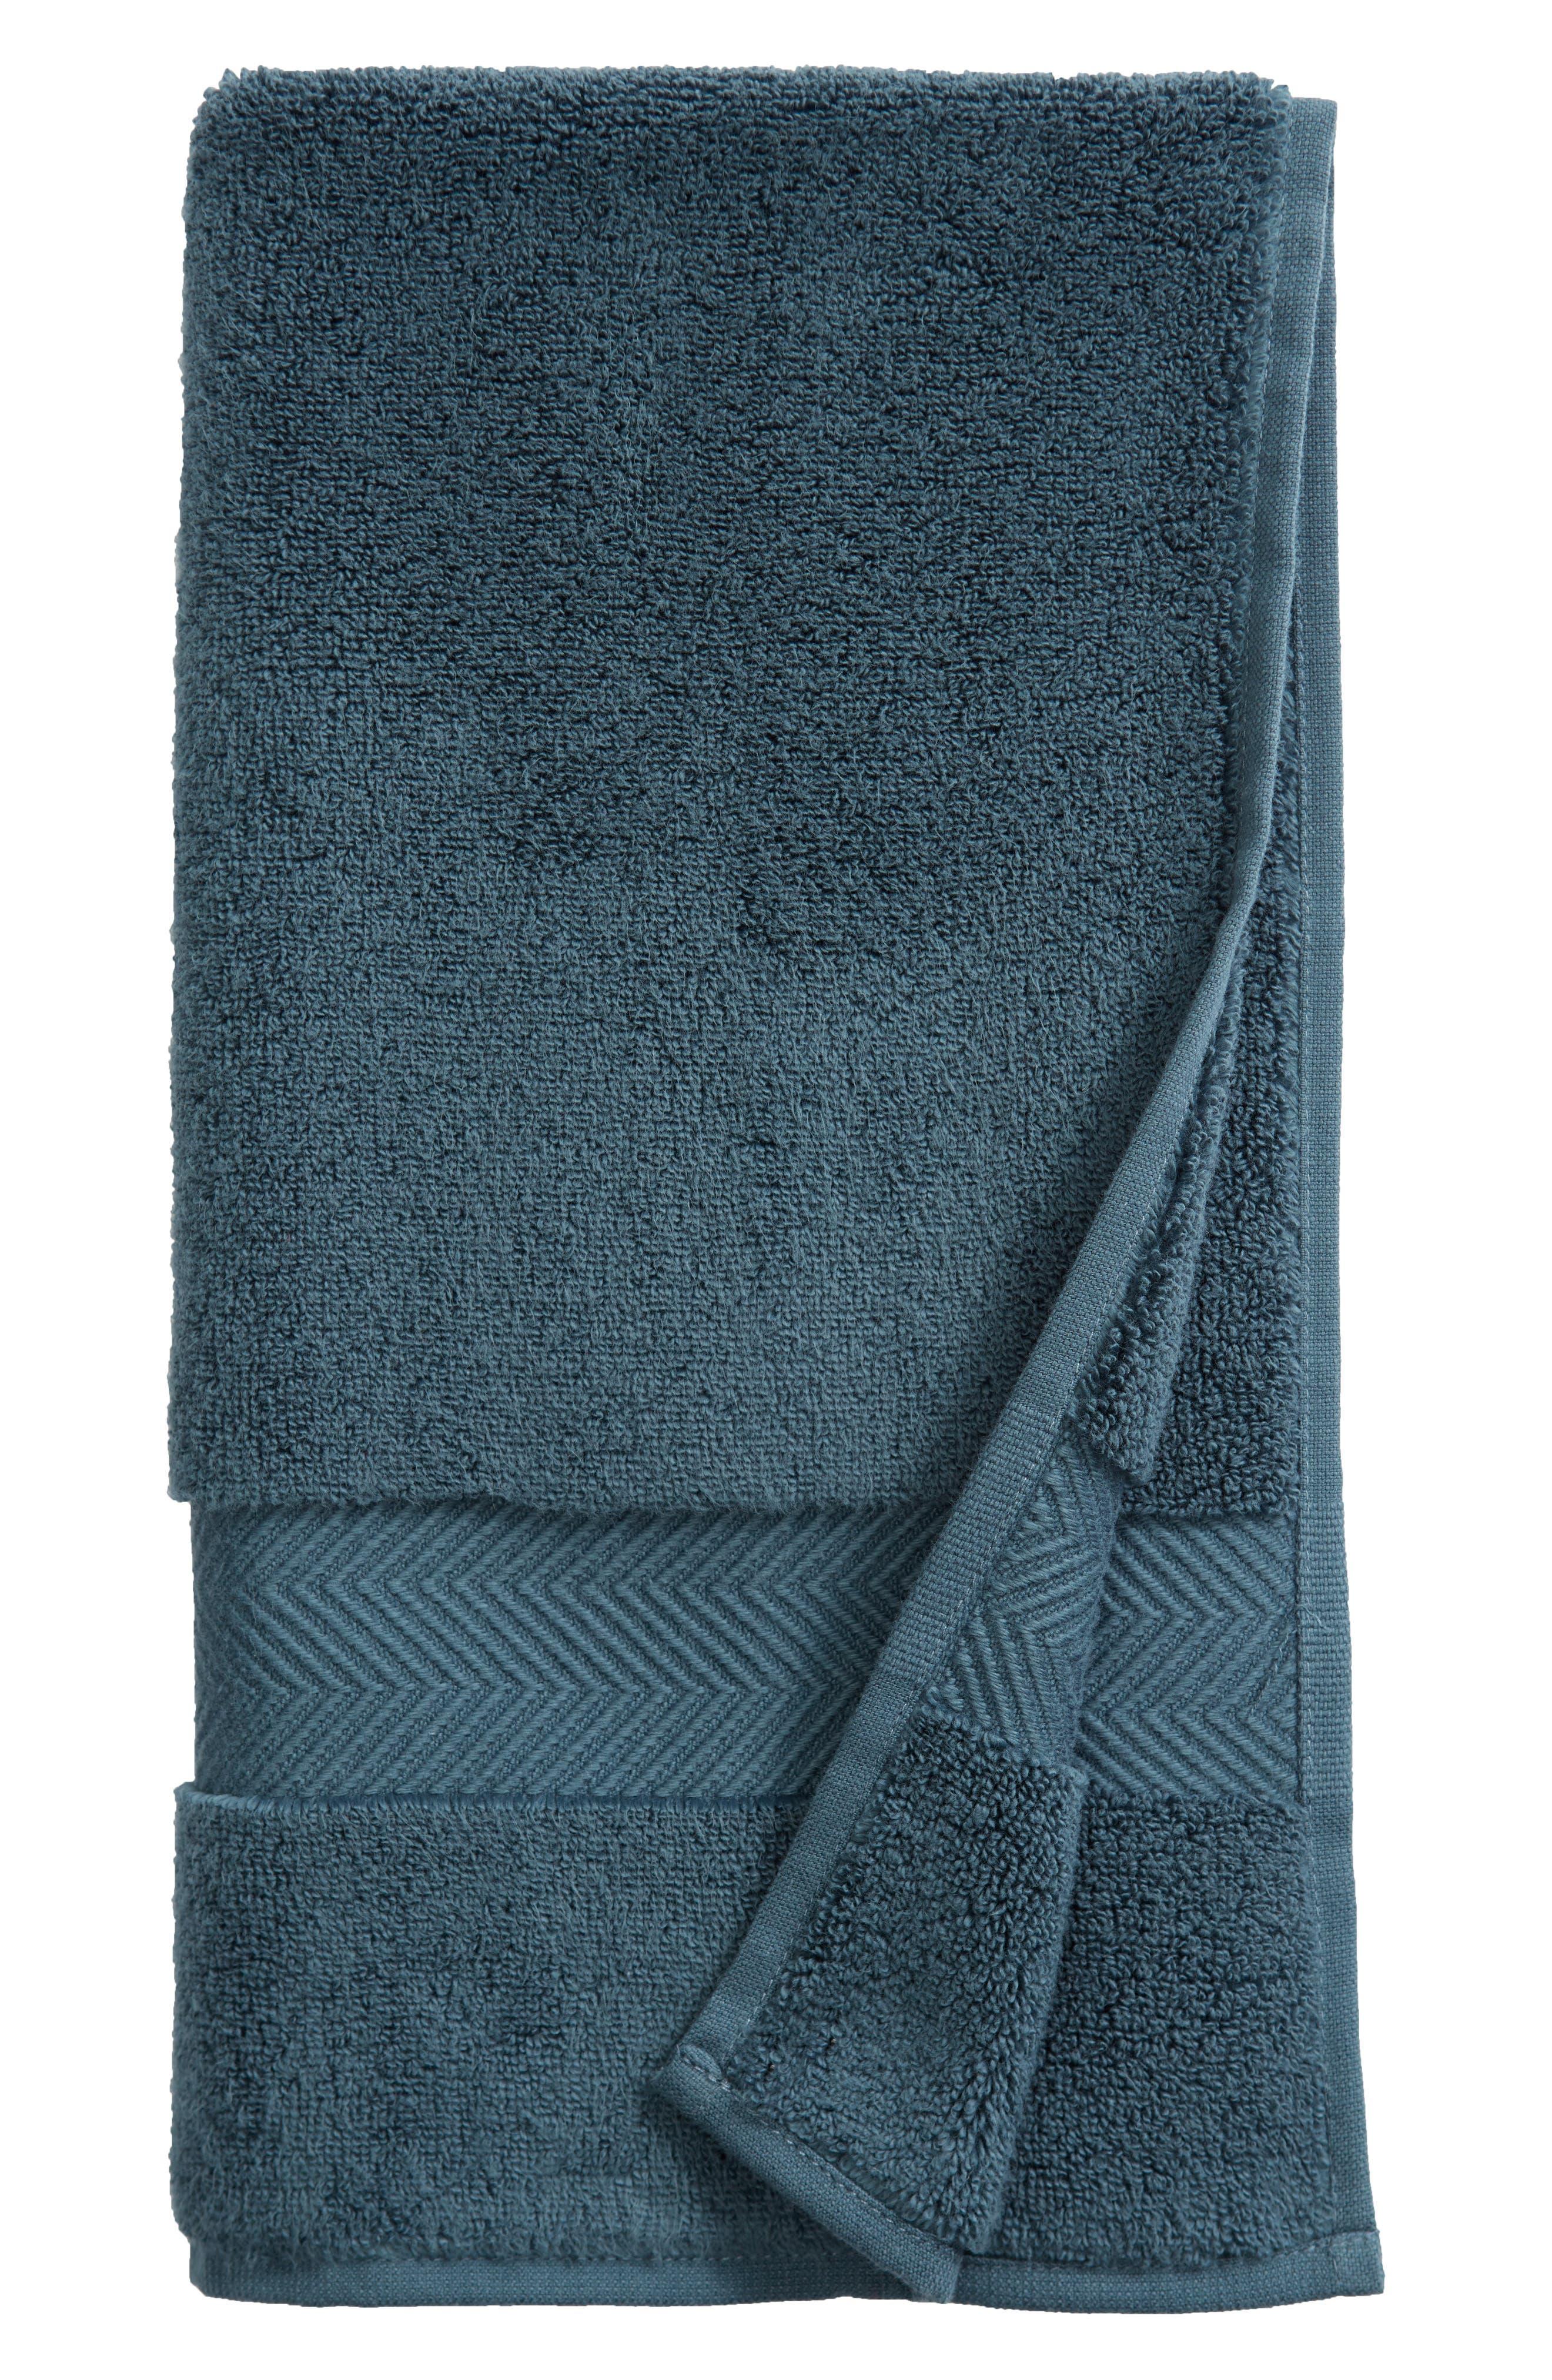 Hydrocotton Hand Towel,                             Main thumbnail 1, color,                             TEAL GAZER